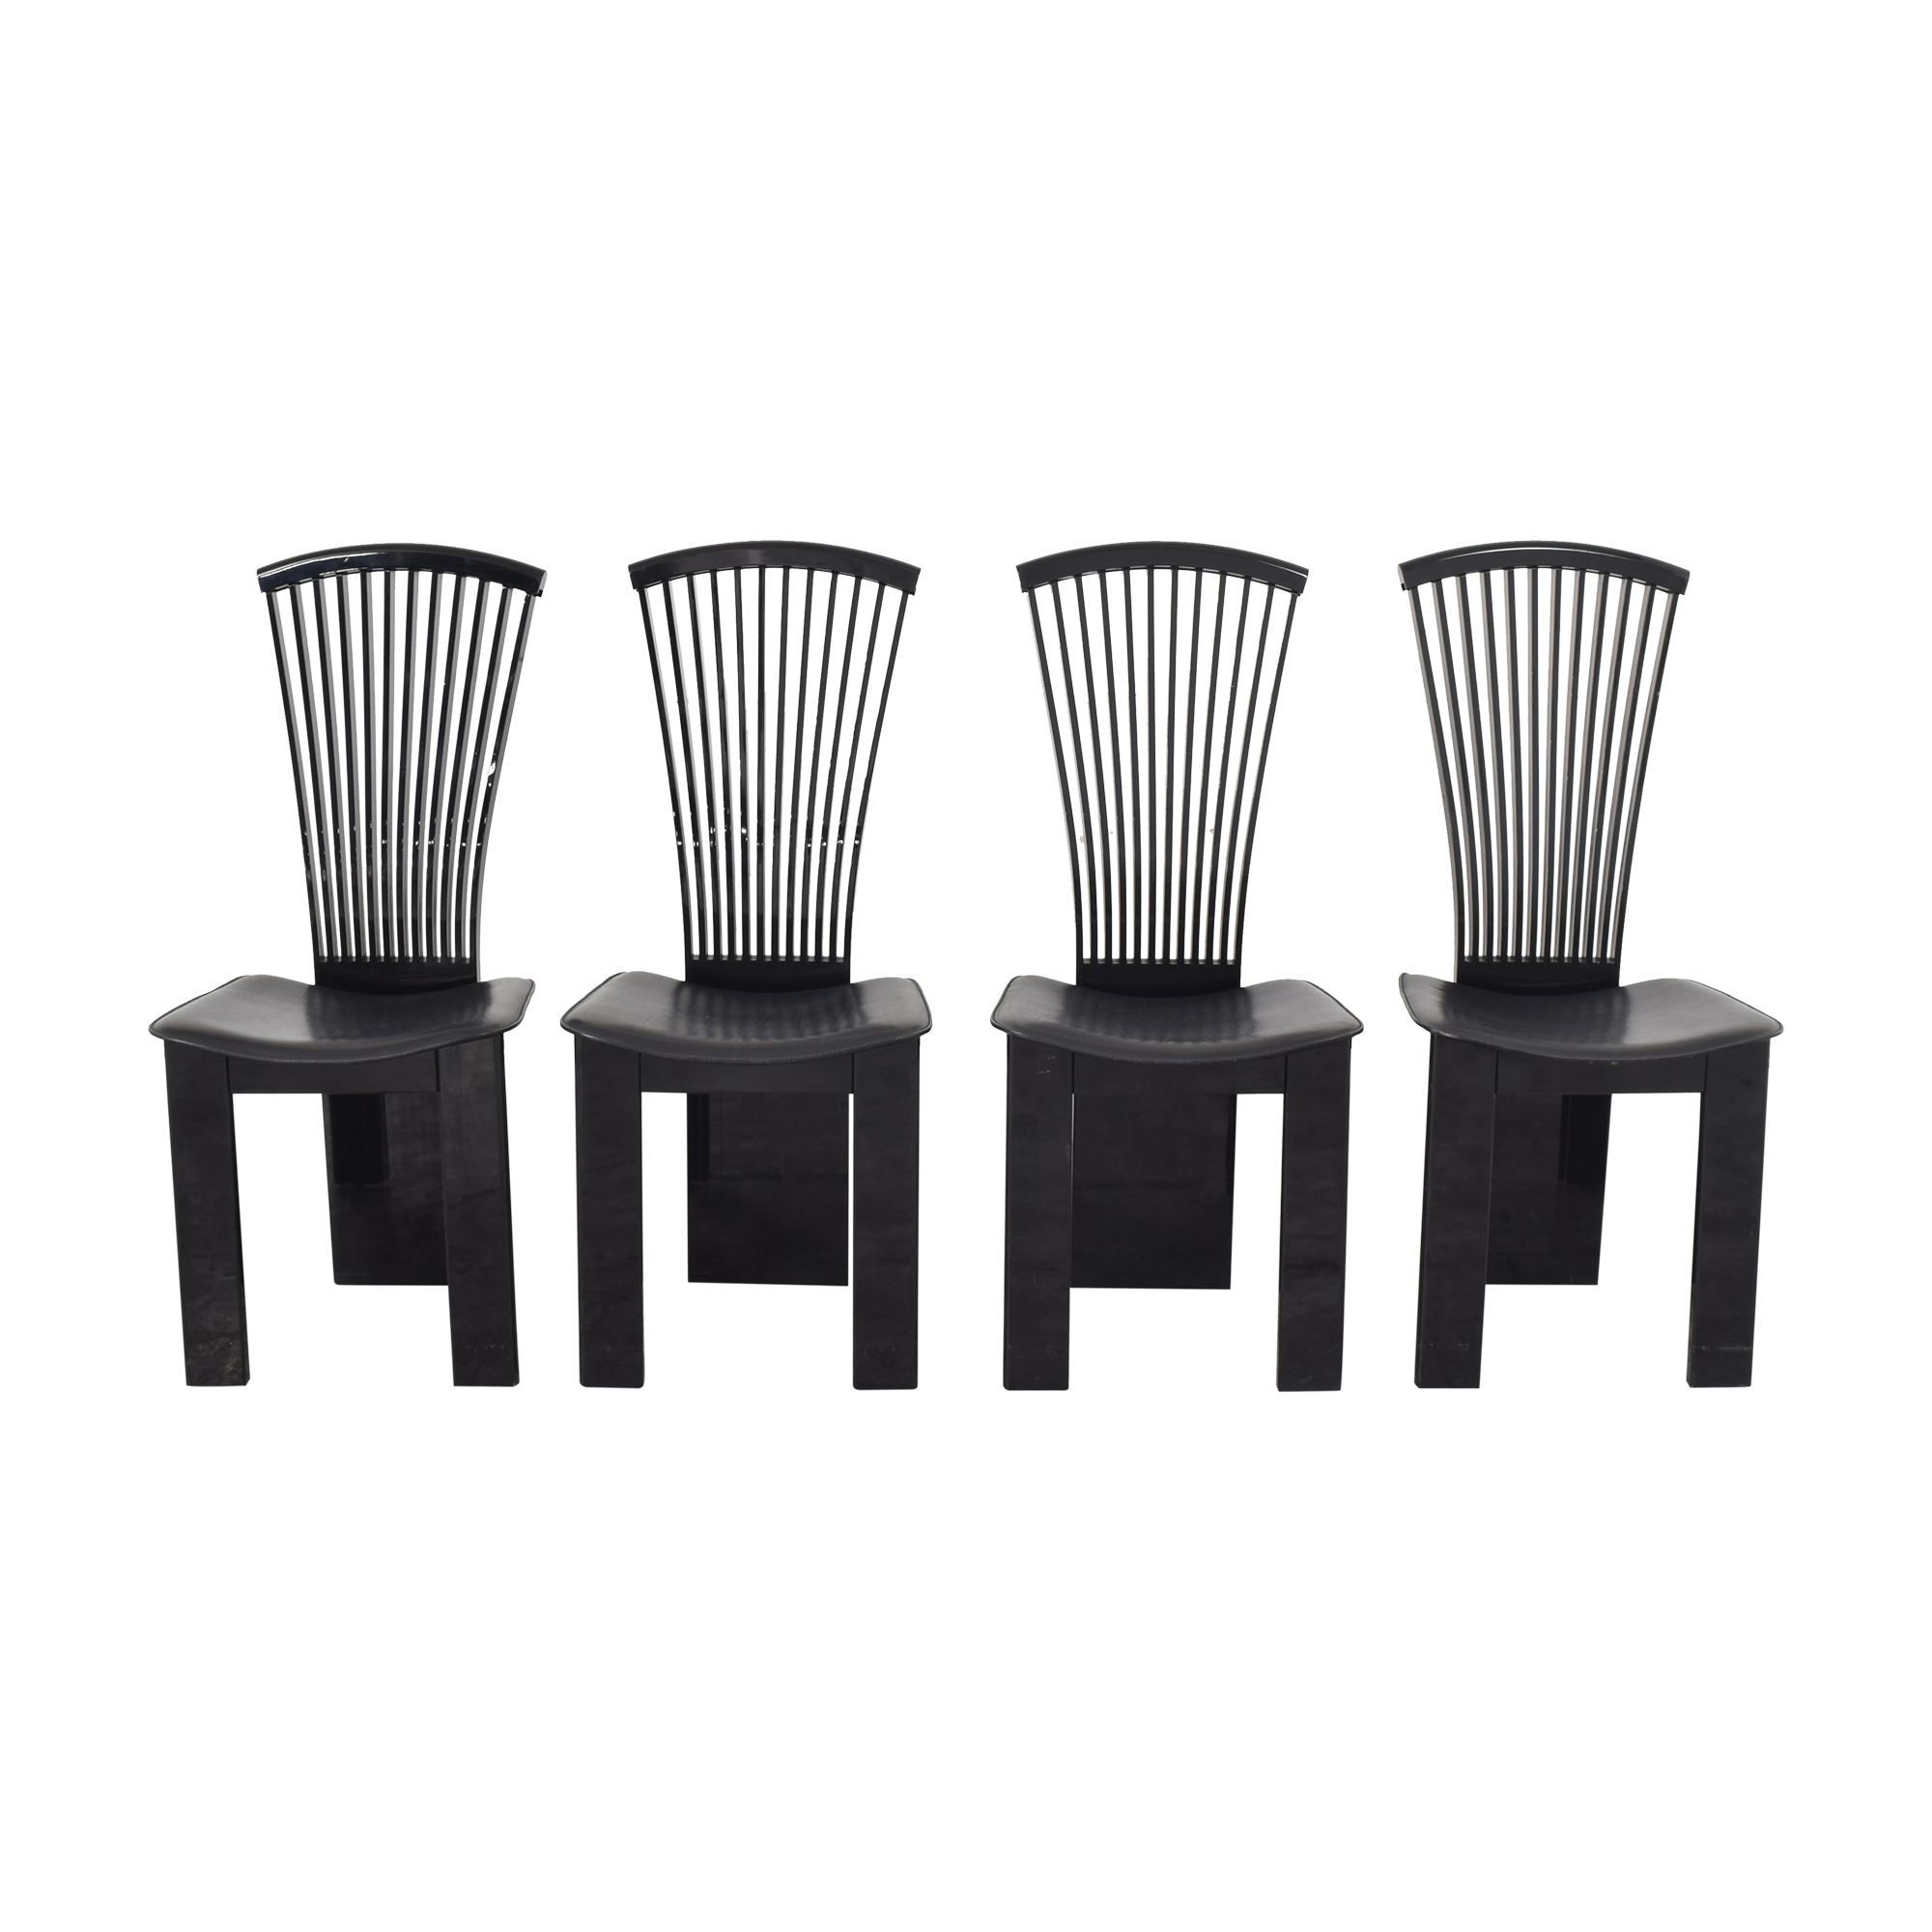 Pietro Costantini Pietro Costantini High Back Dining Chairs black